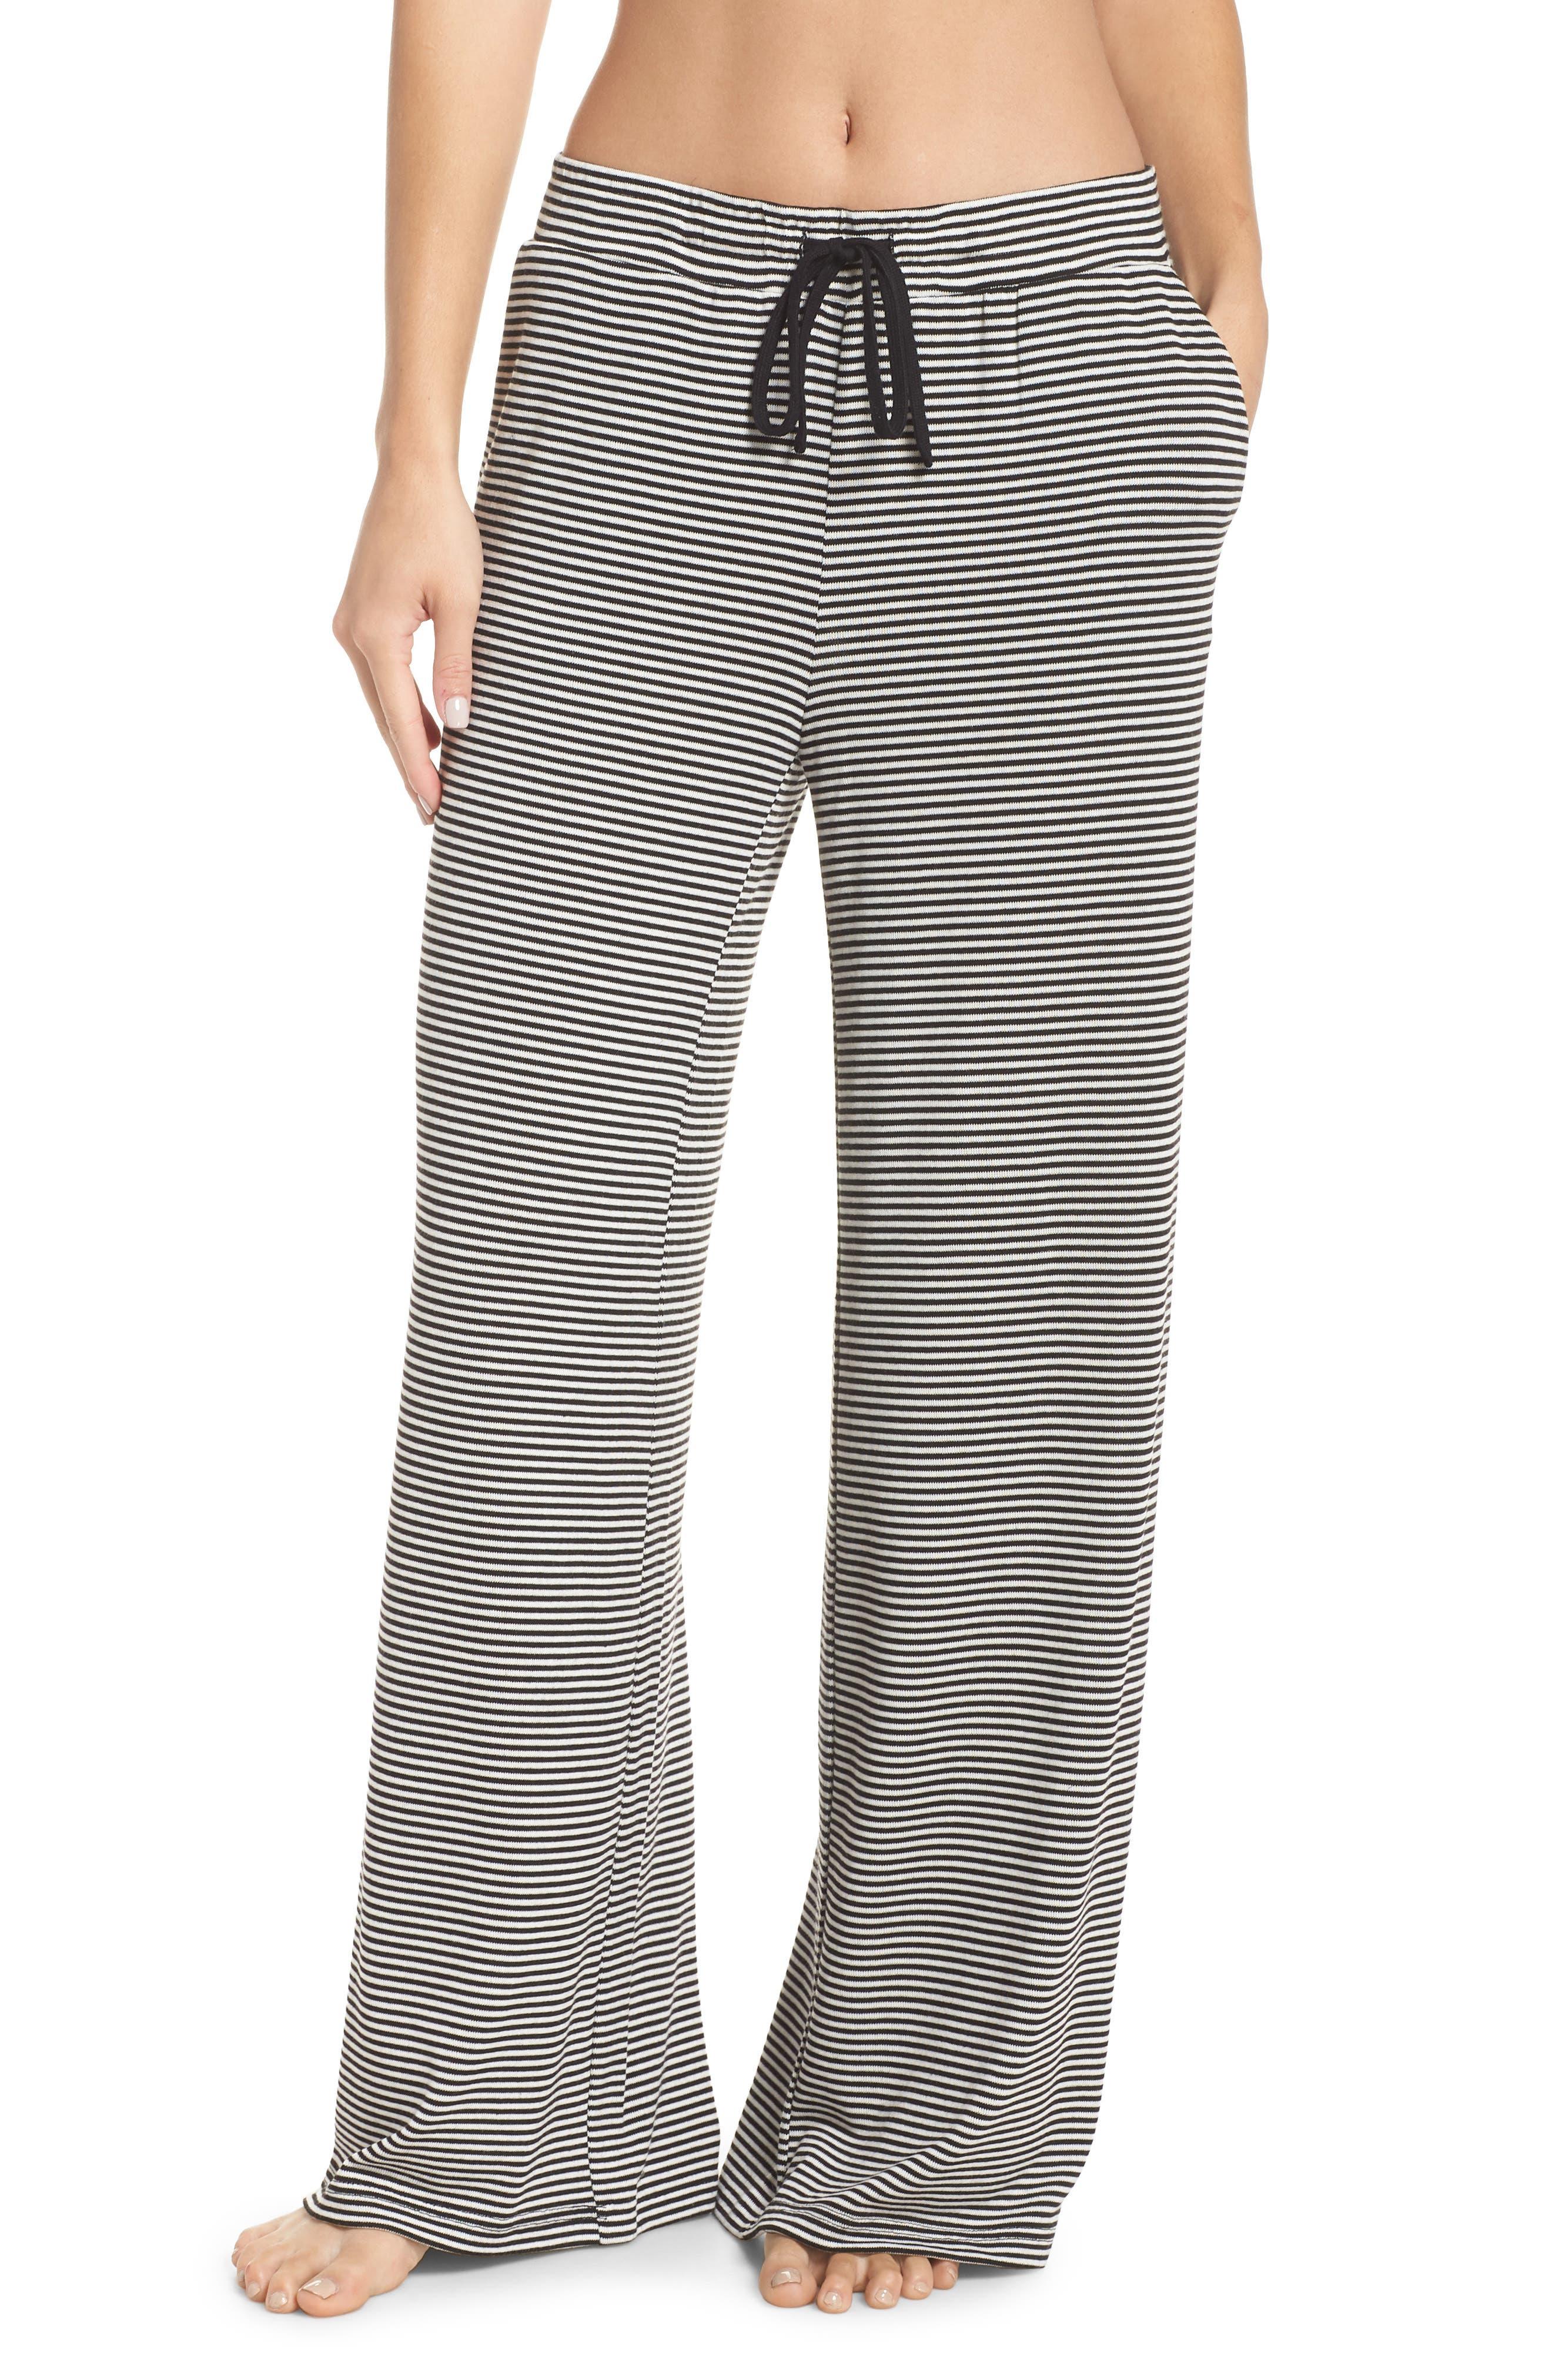 Dreams Wide Leg Pajama Pants,                         Main,                         color, BLACK